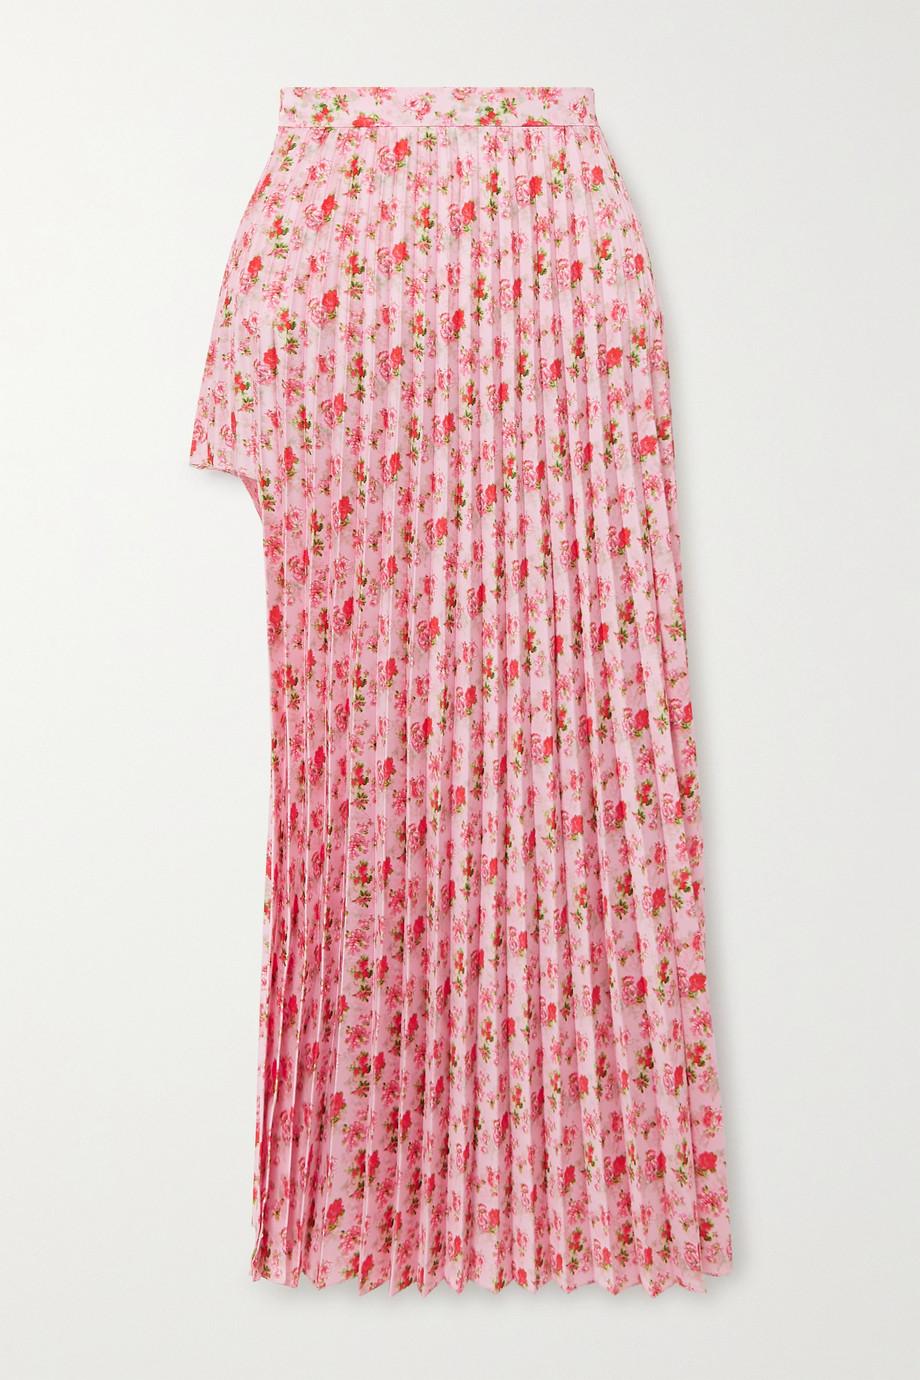 Vetements Floral-print plissé-crepe midi skirt